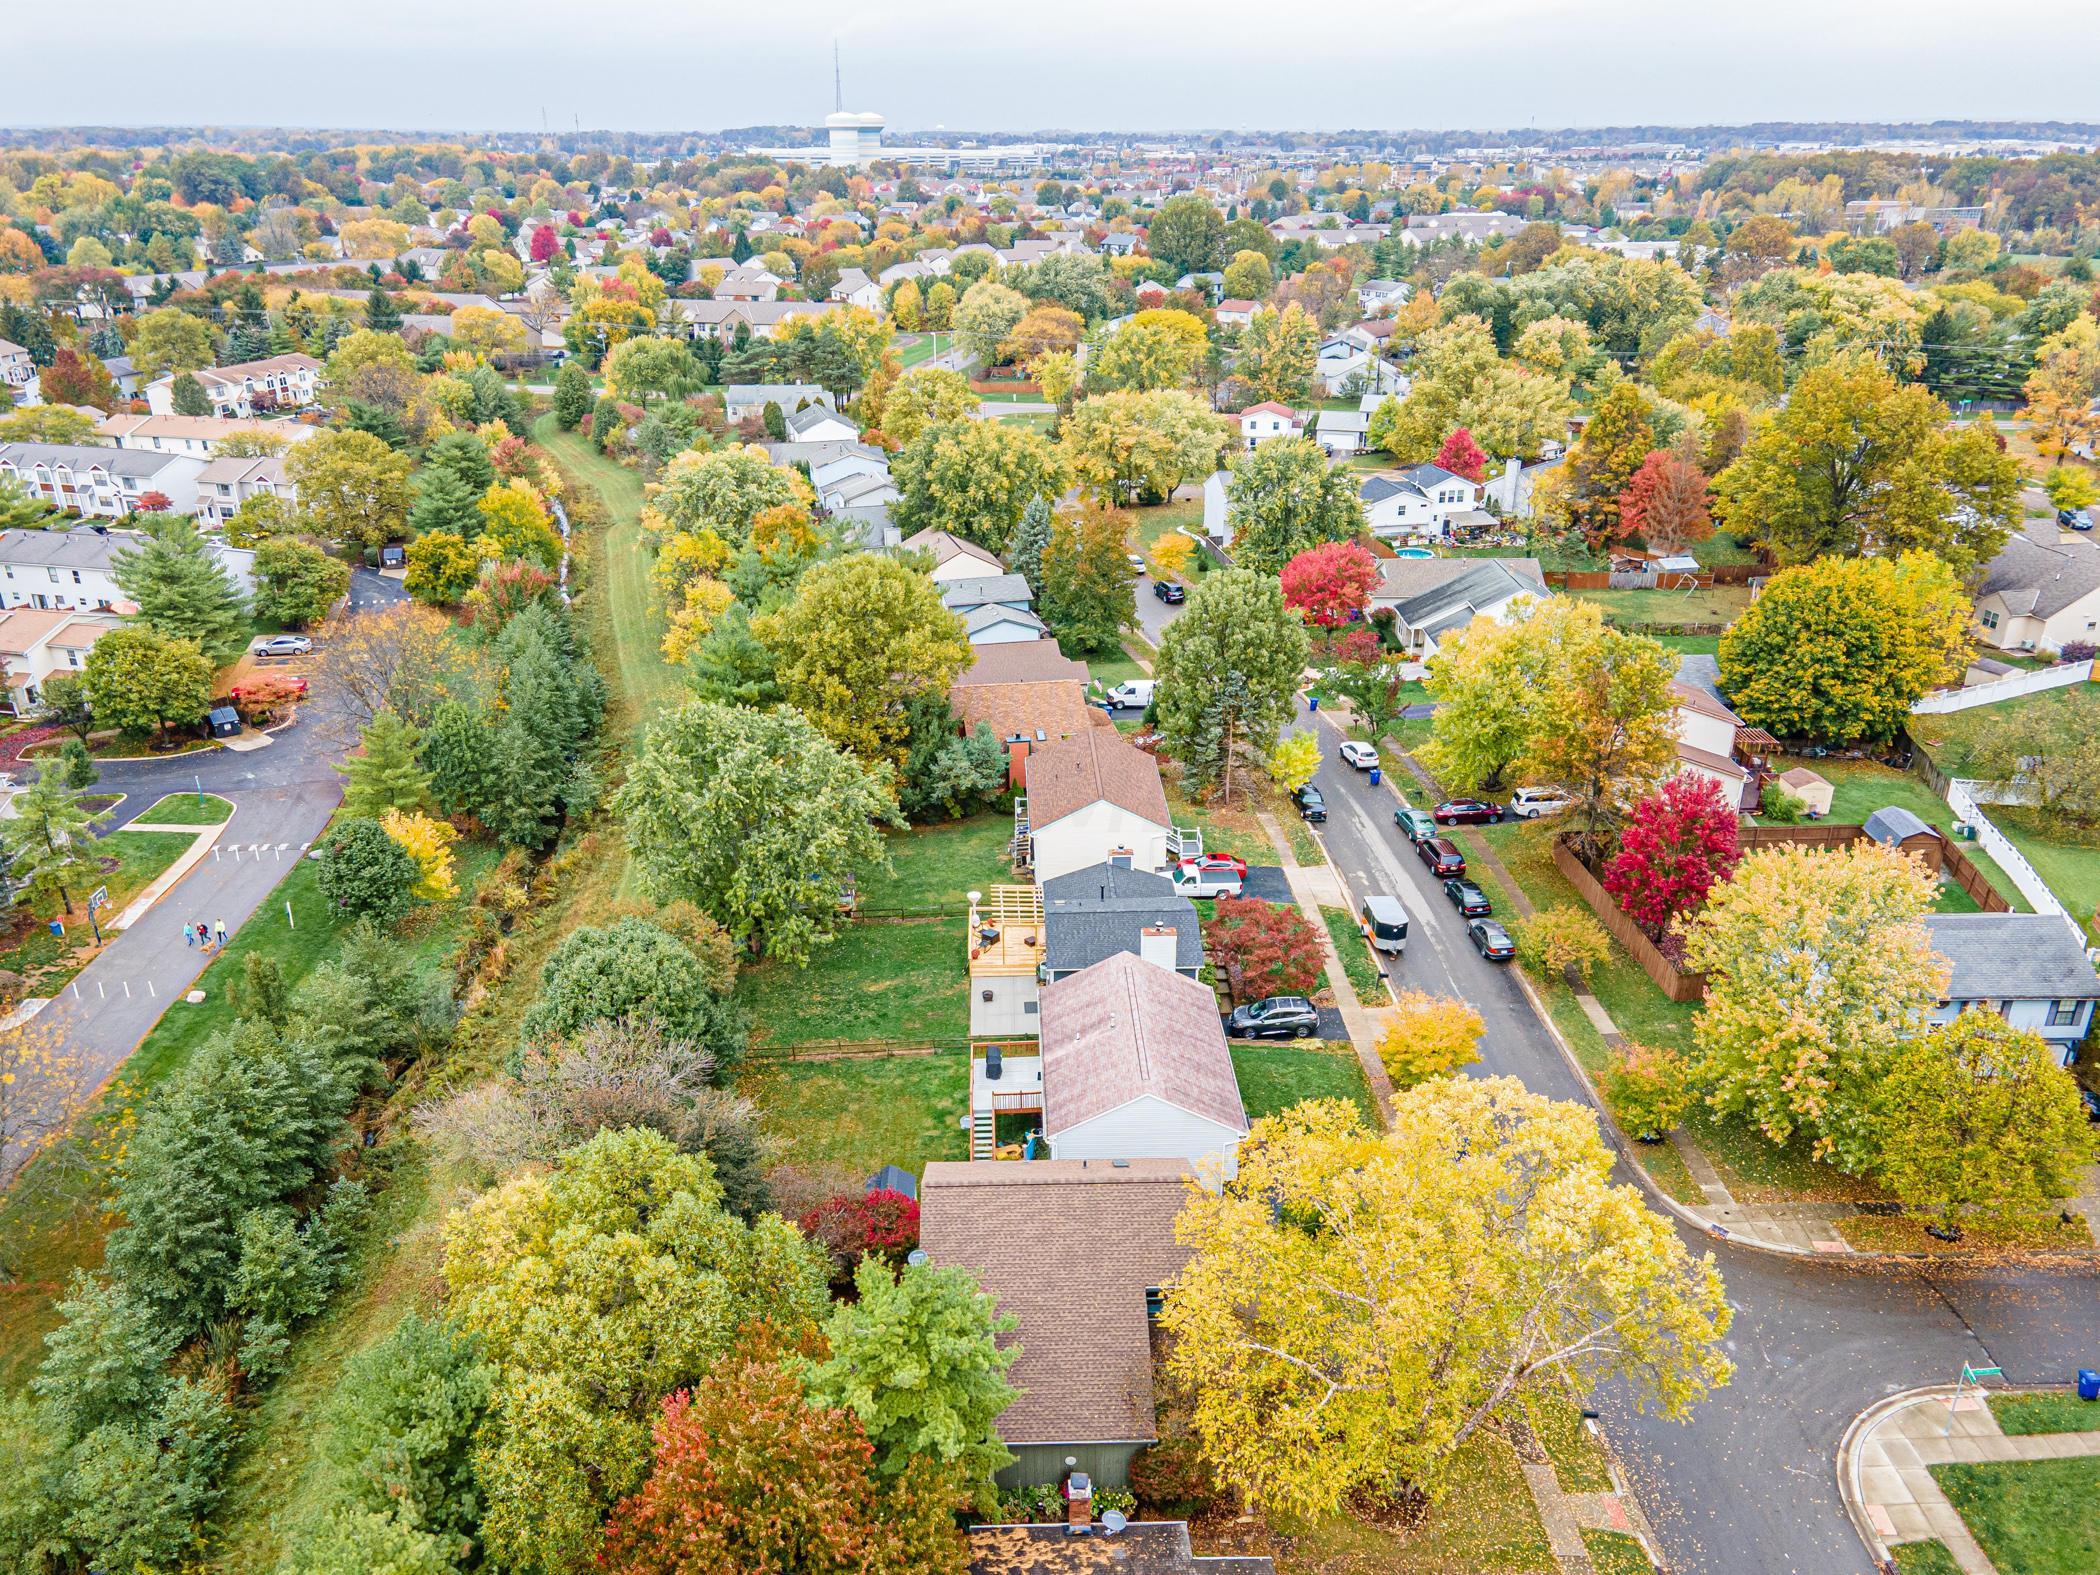 7777 Kiowa Way, Worthington, Ohio 43085, 3 Bedrooms Bedrooms, ,2 BathroomsBathrooms,Residential,For Sale,Kiowa,220040751